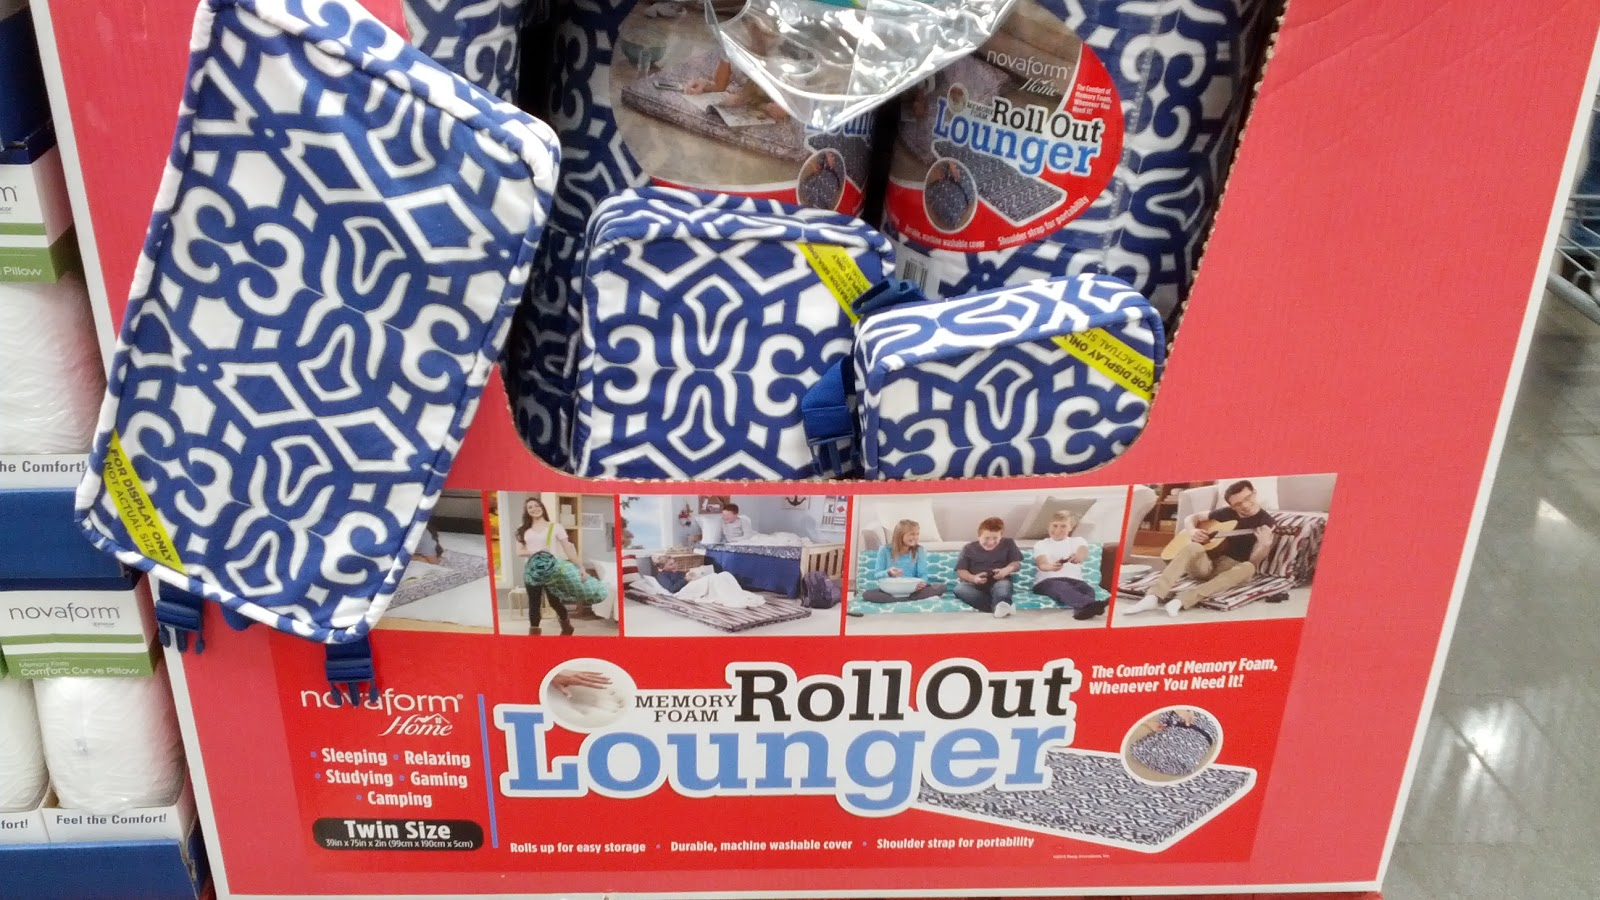 Camping bed costco - Novaform Home Roll Out Memory Foam Lounger Costco Desk Chair Floor Mat Costco Lamb Plush